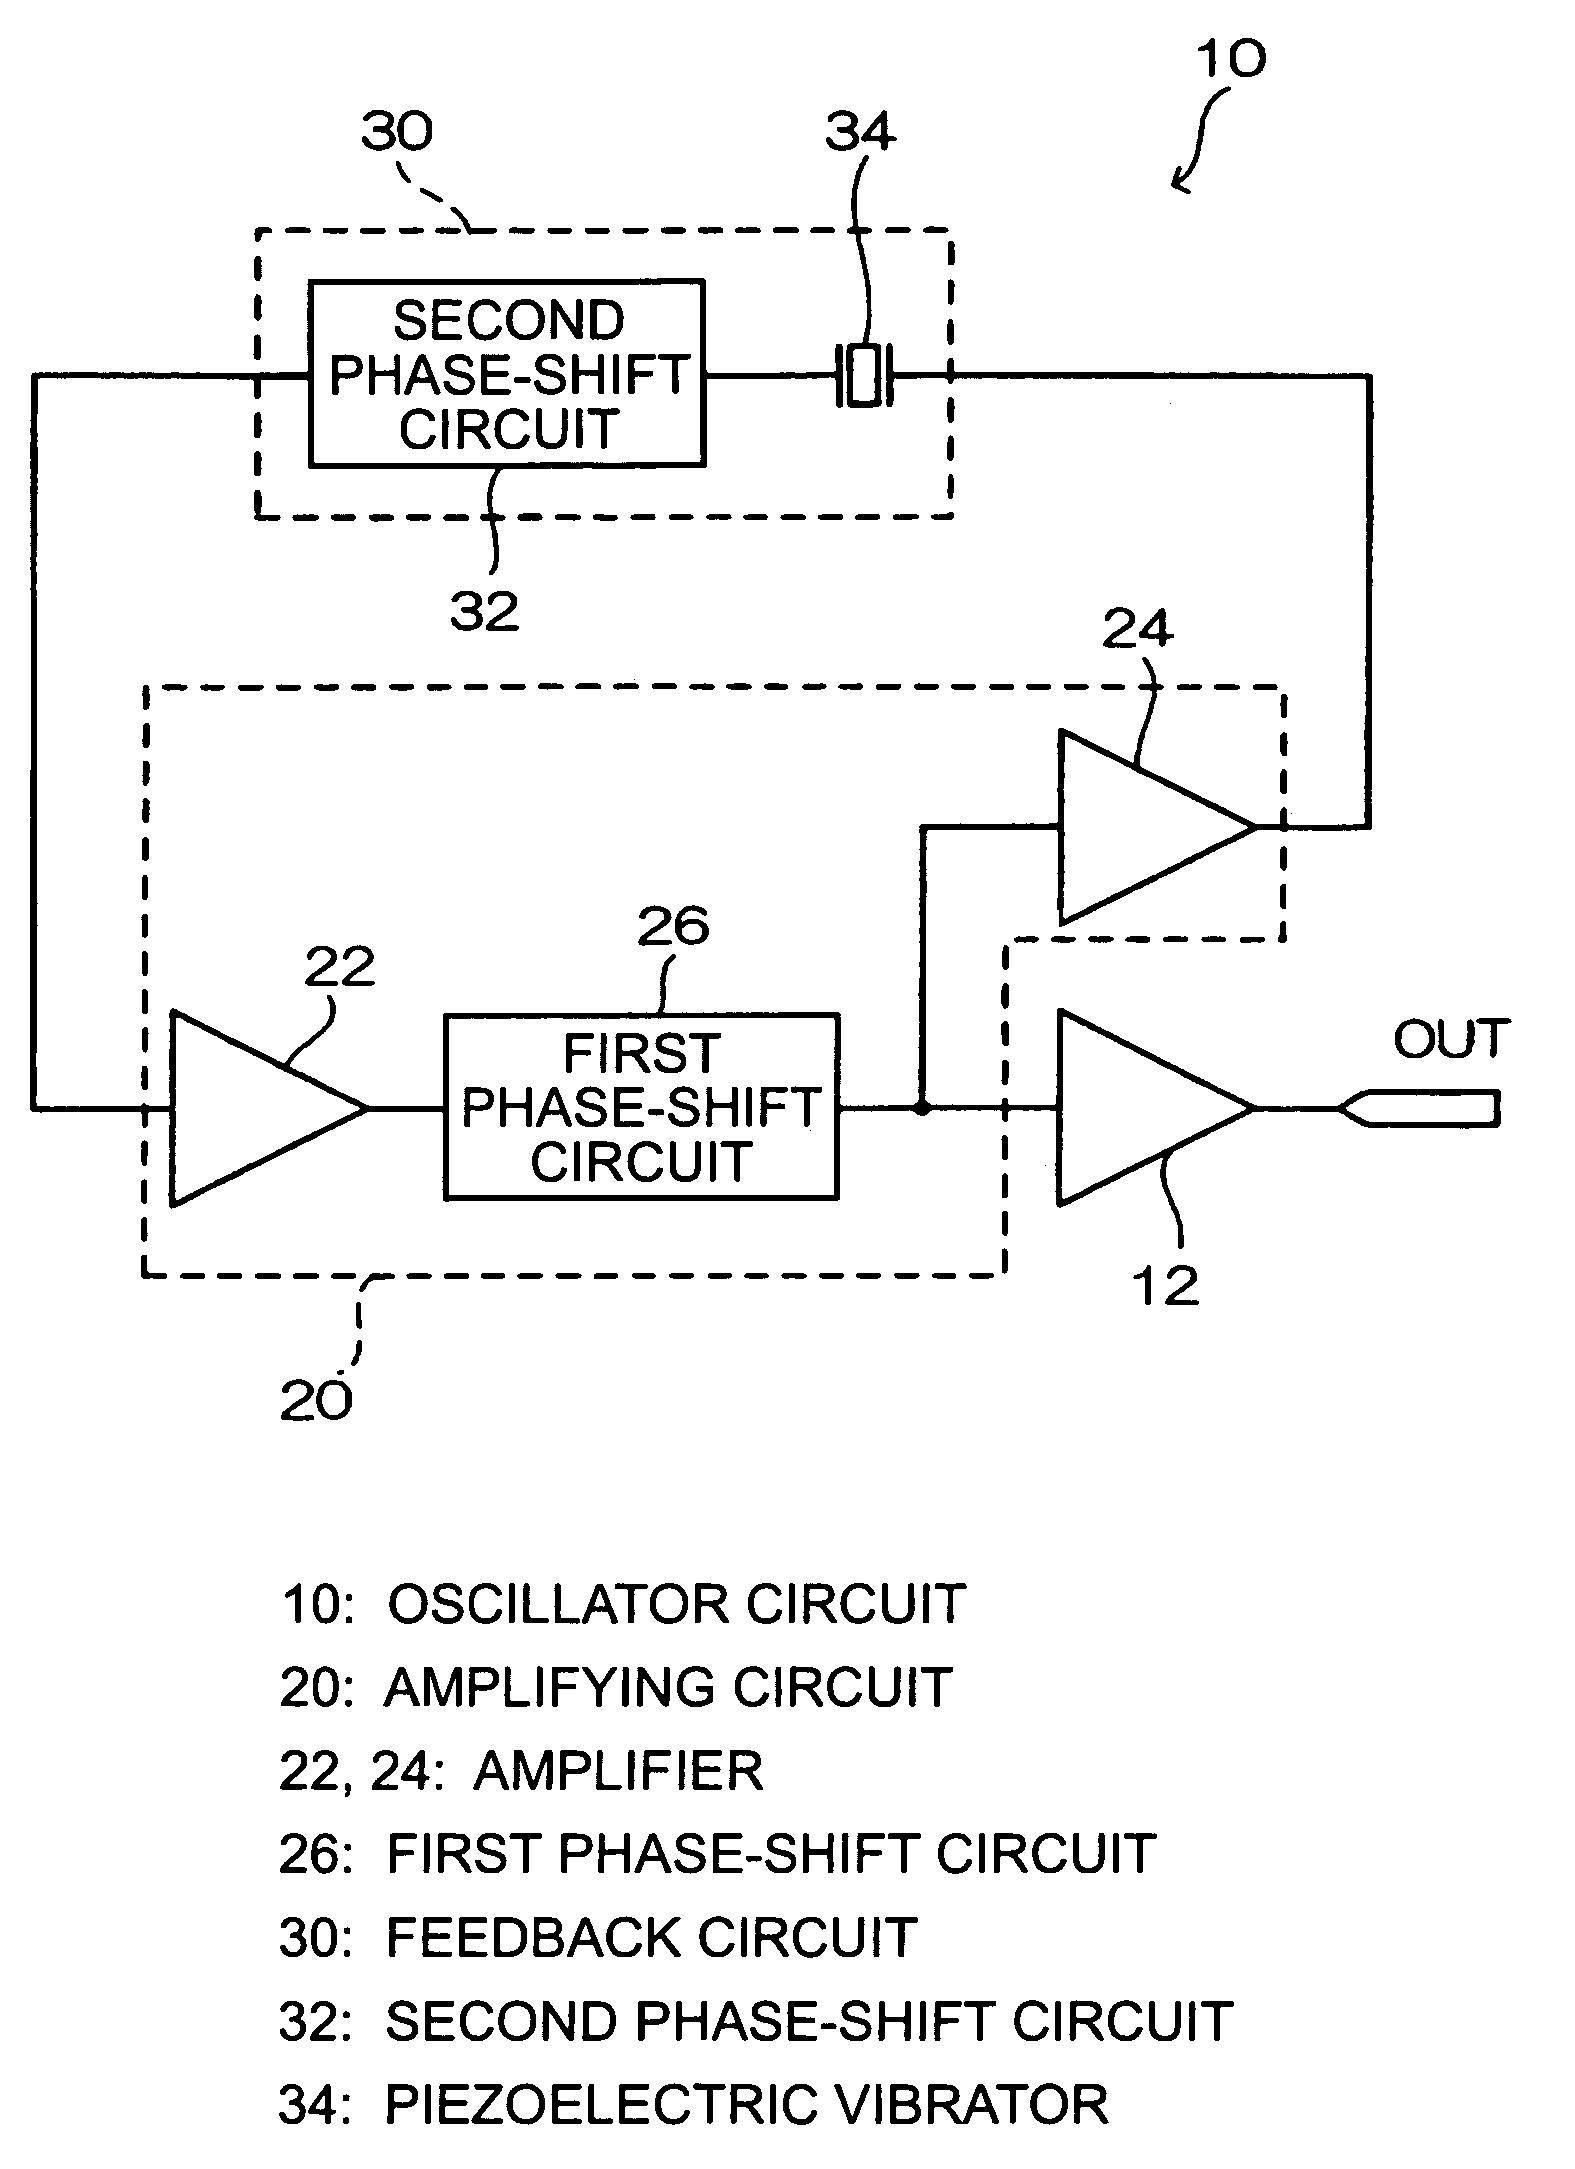 Us7046096 Oscillator Circuit Phase Shift Using Transistor Image Patent Drawing